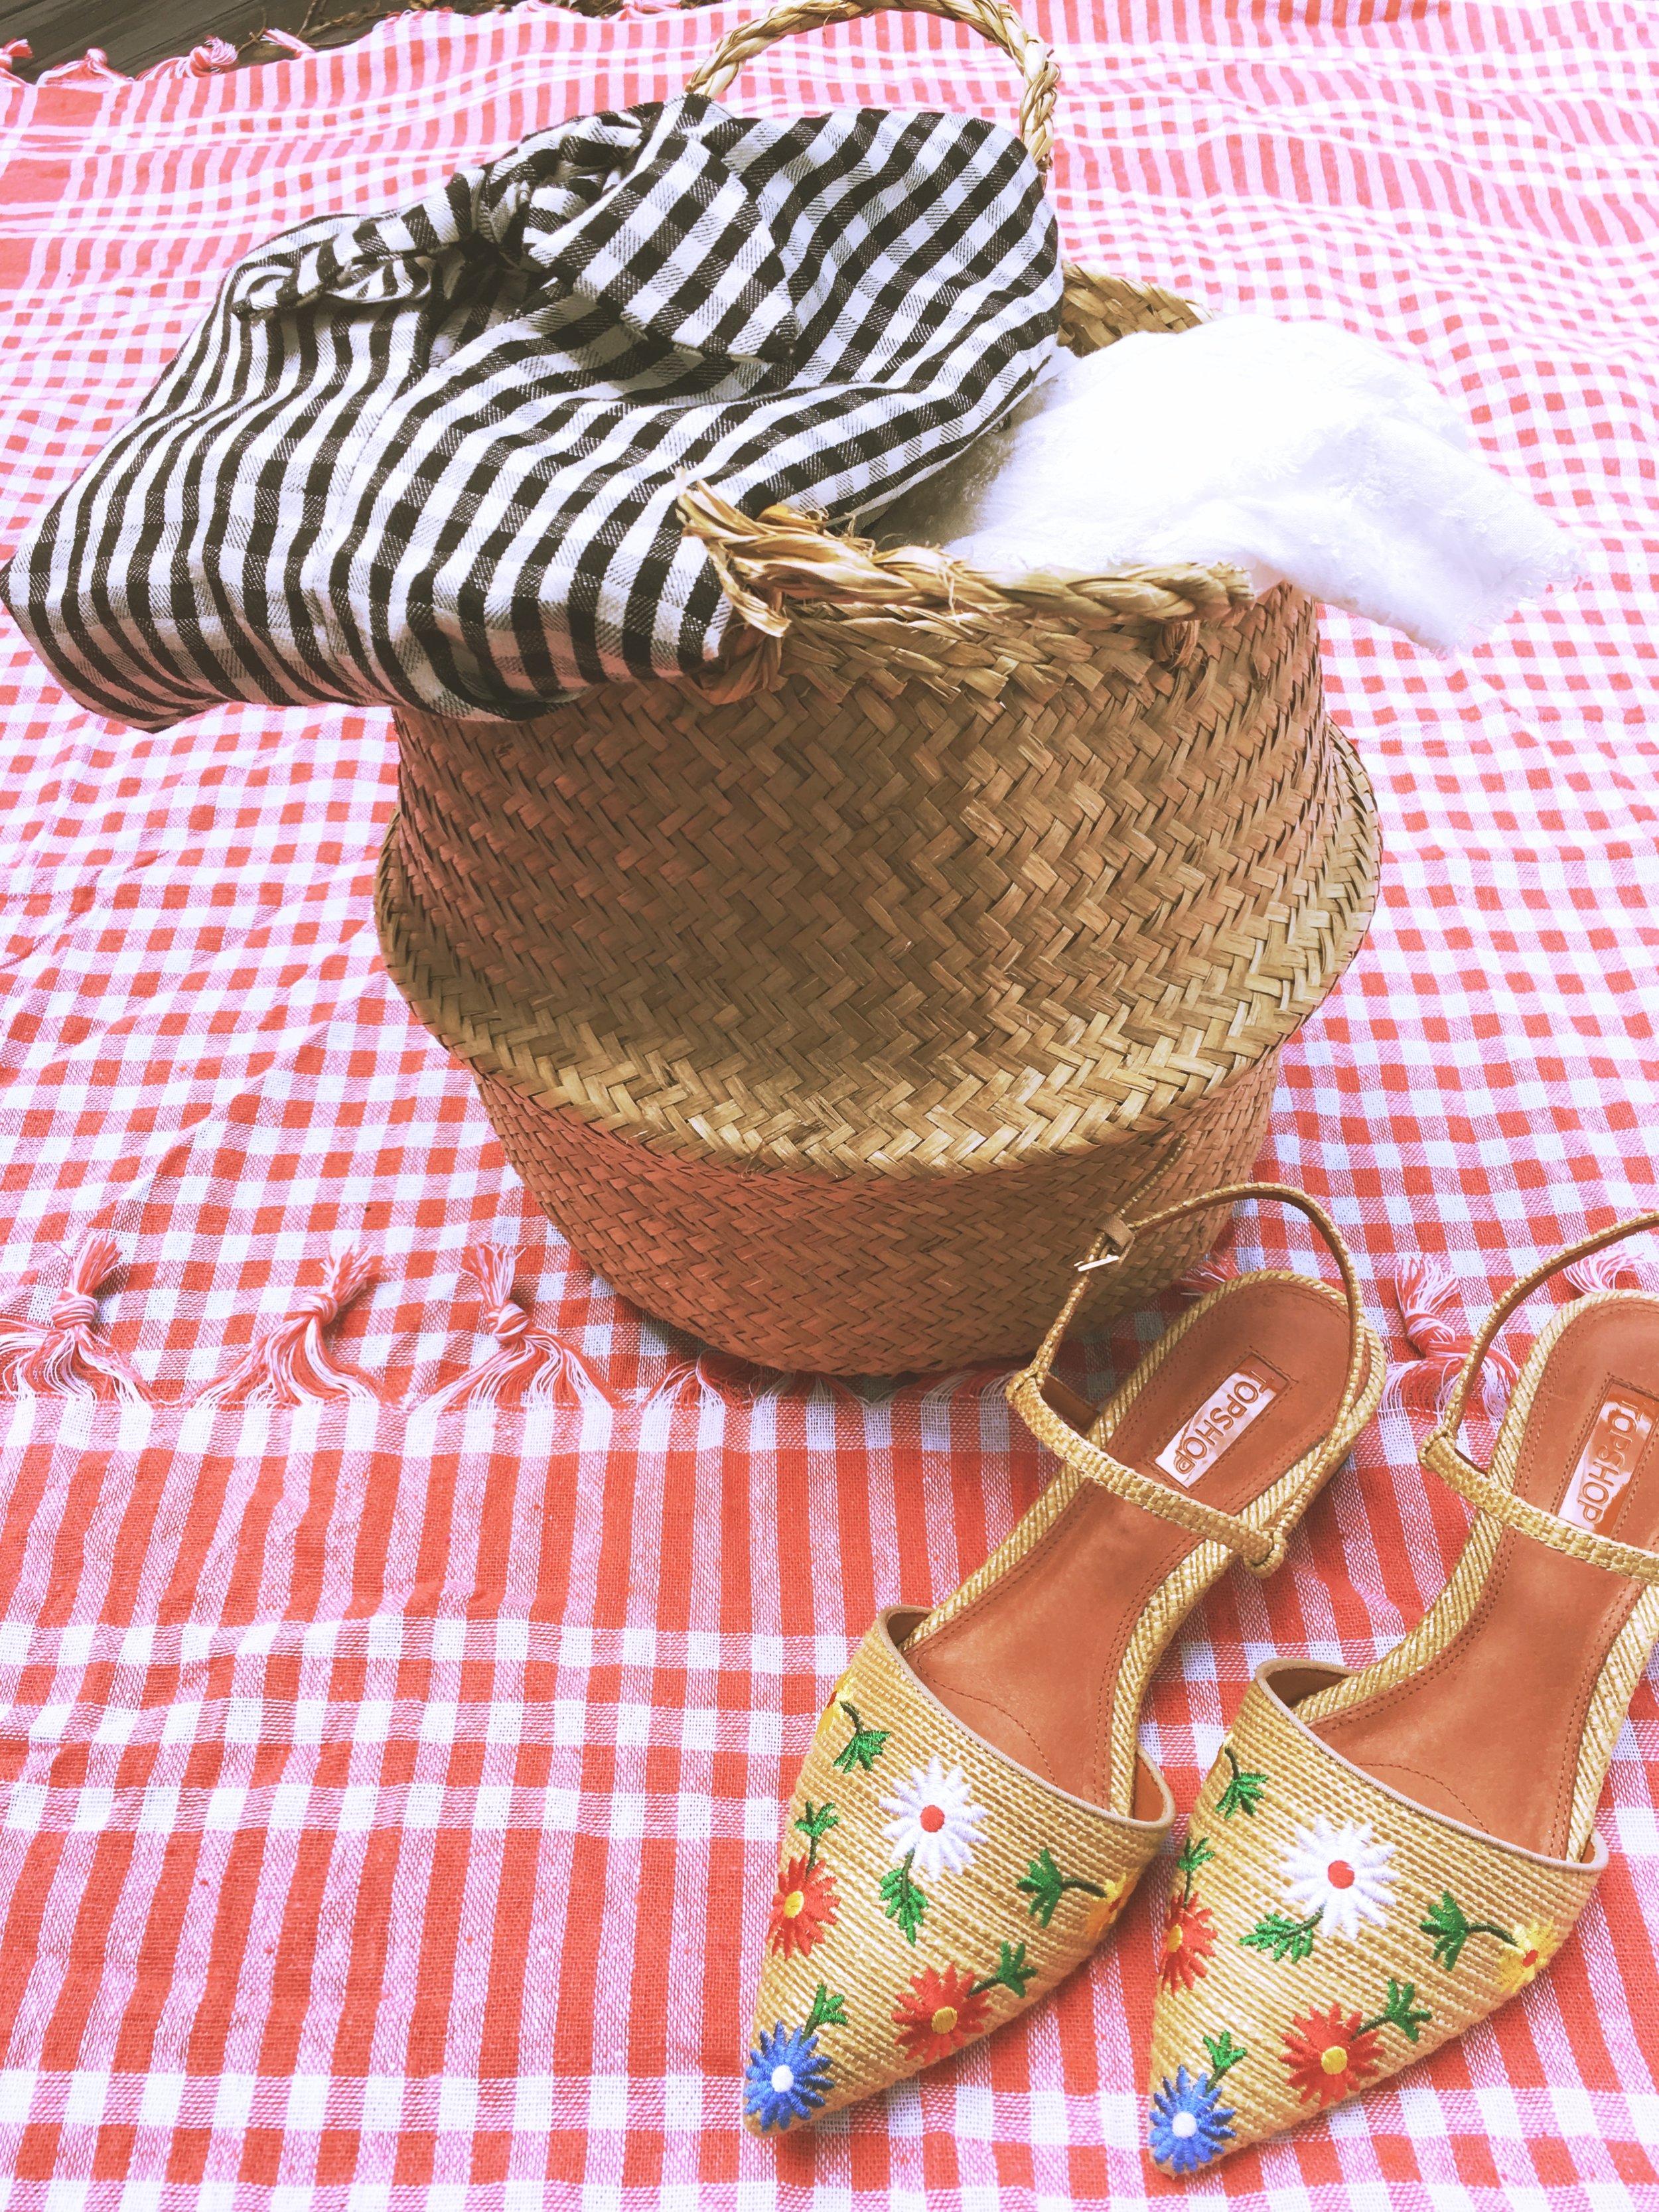 84b310007d7 Picnic basket — I M A COOL GIRL